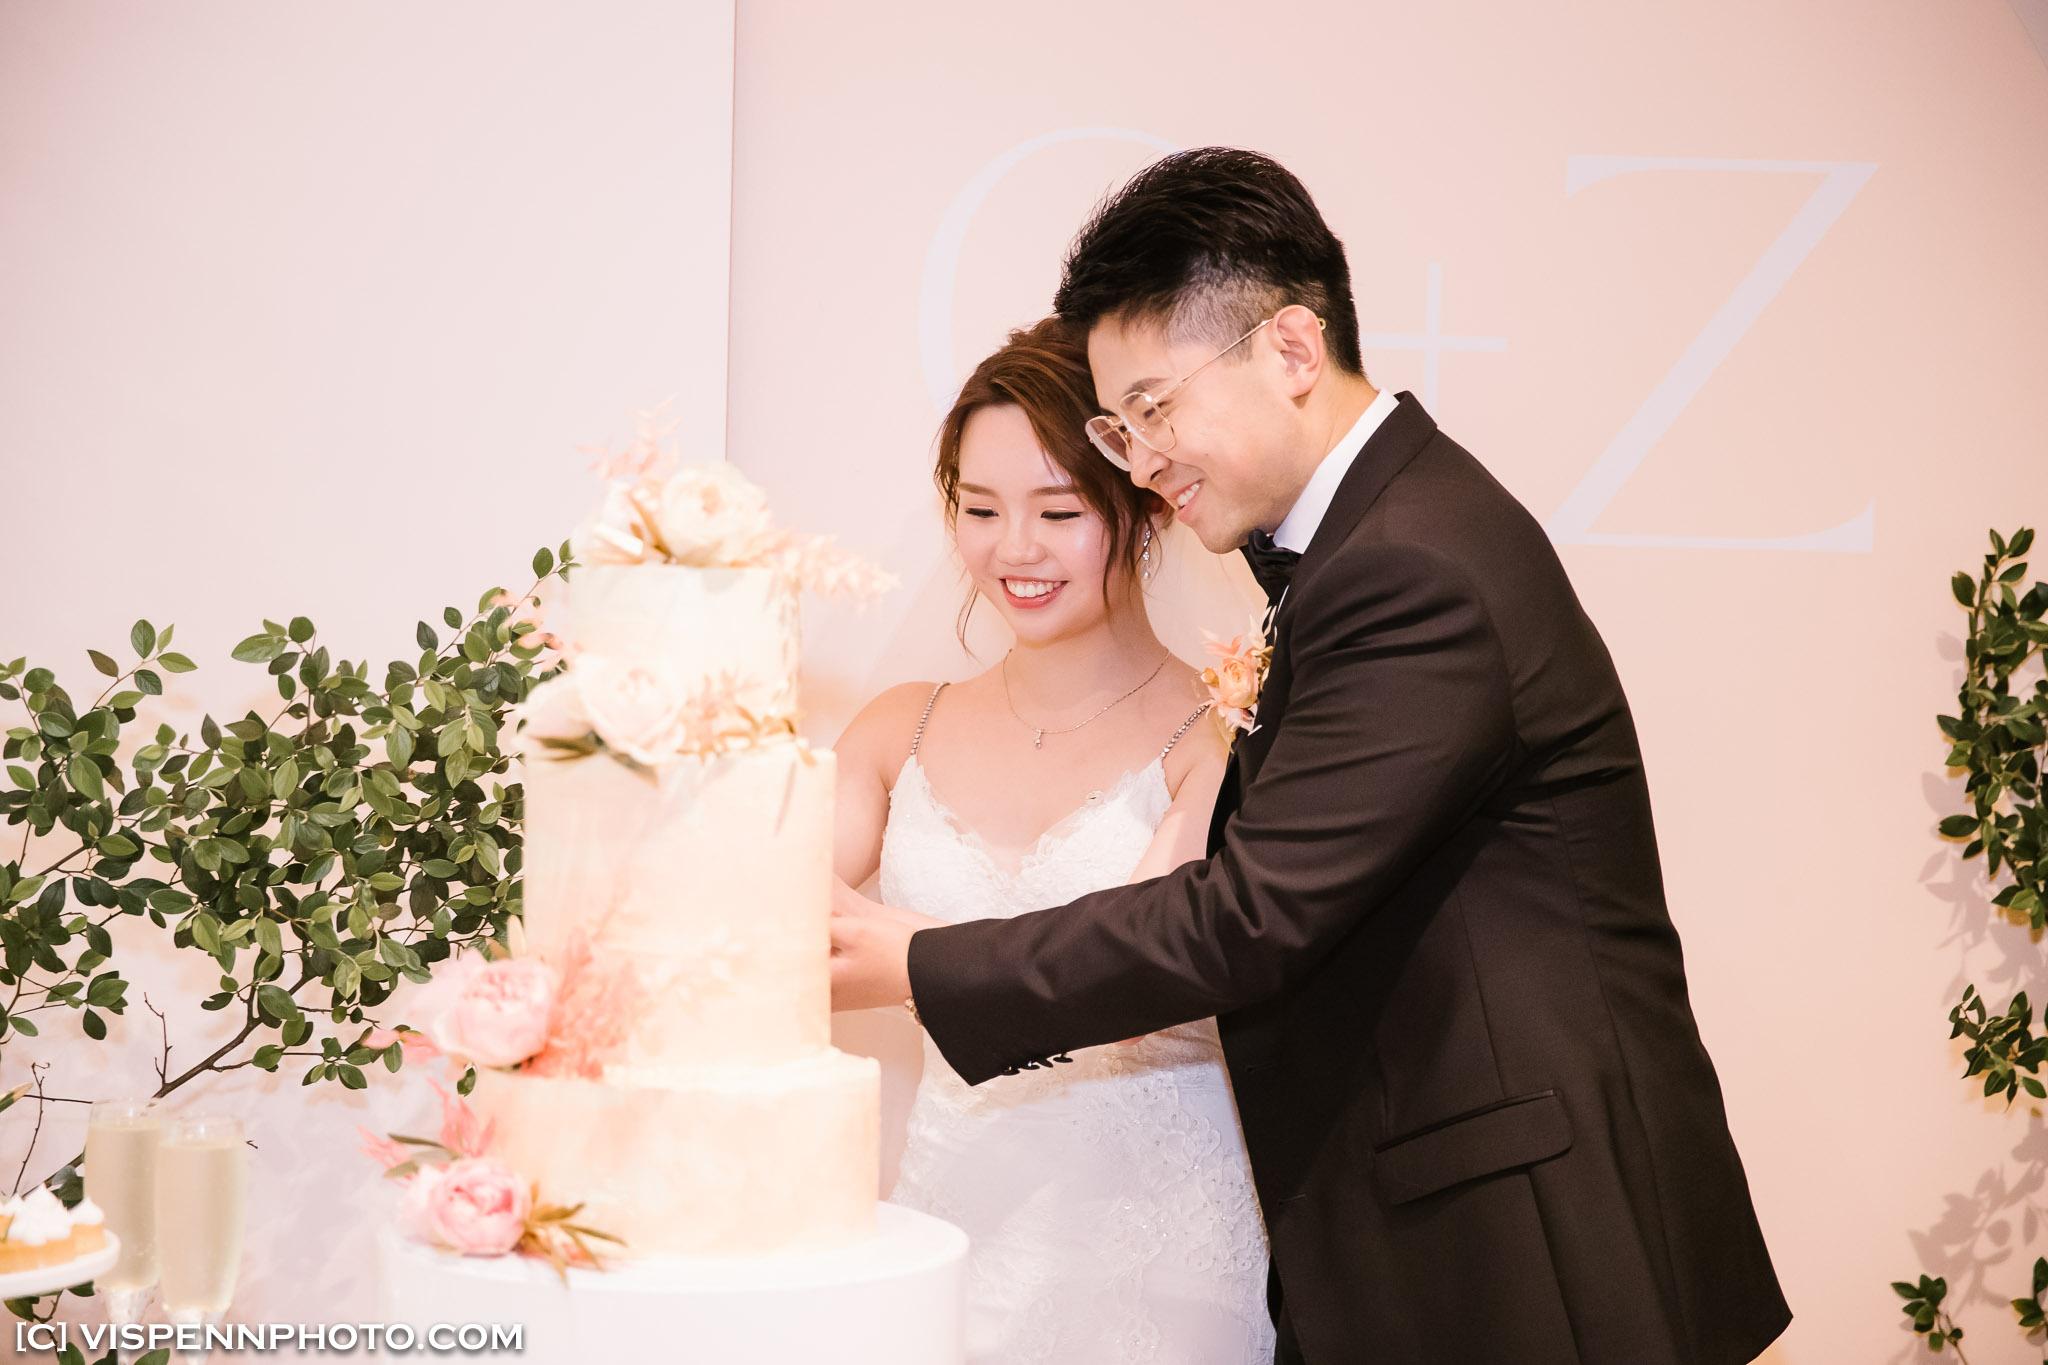 WEDDING DAY Photography Melbourne VISPENN 墨尔本 婚礼跟拍 婚礼摄像 婚礼摄影 结婚照 登记照 ElitaPB 10057 2P 1DX2 VISPENN